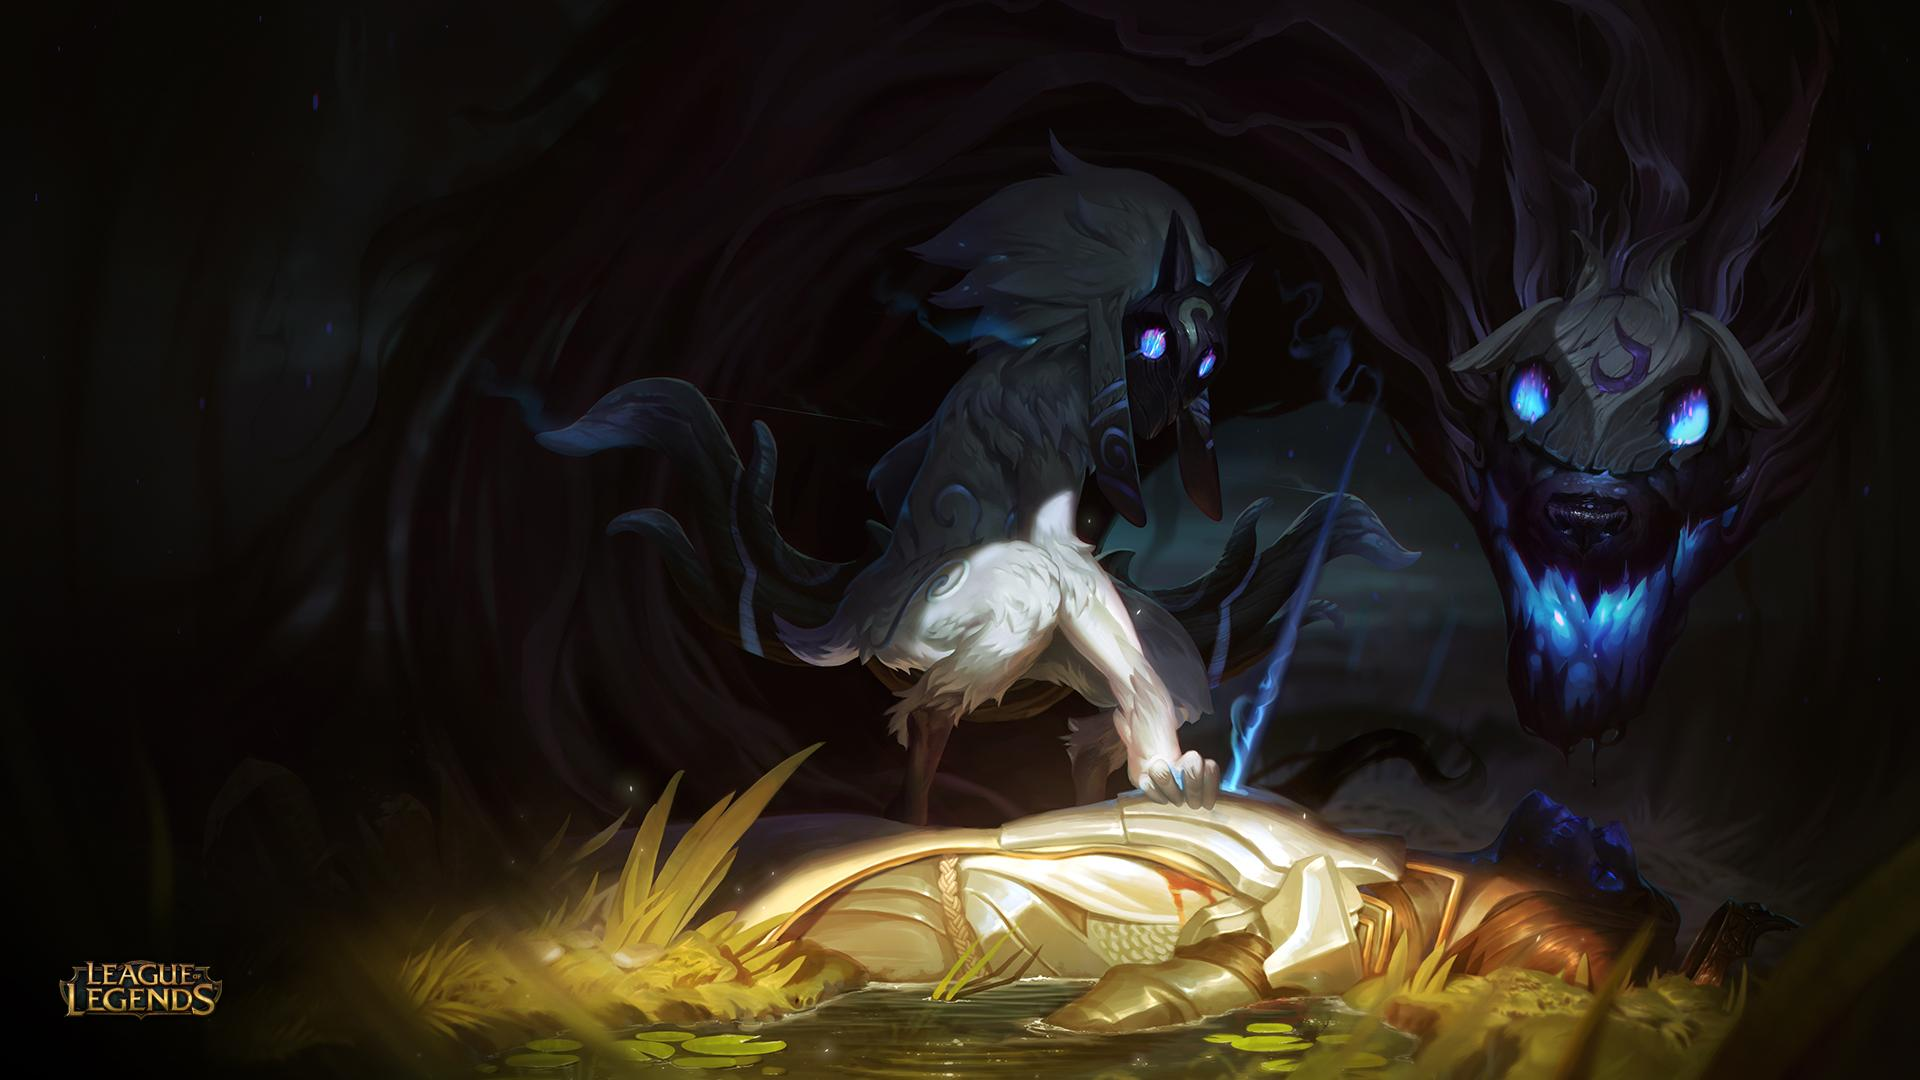 League Of Legends Announces New Champion 'Kindred'